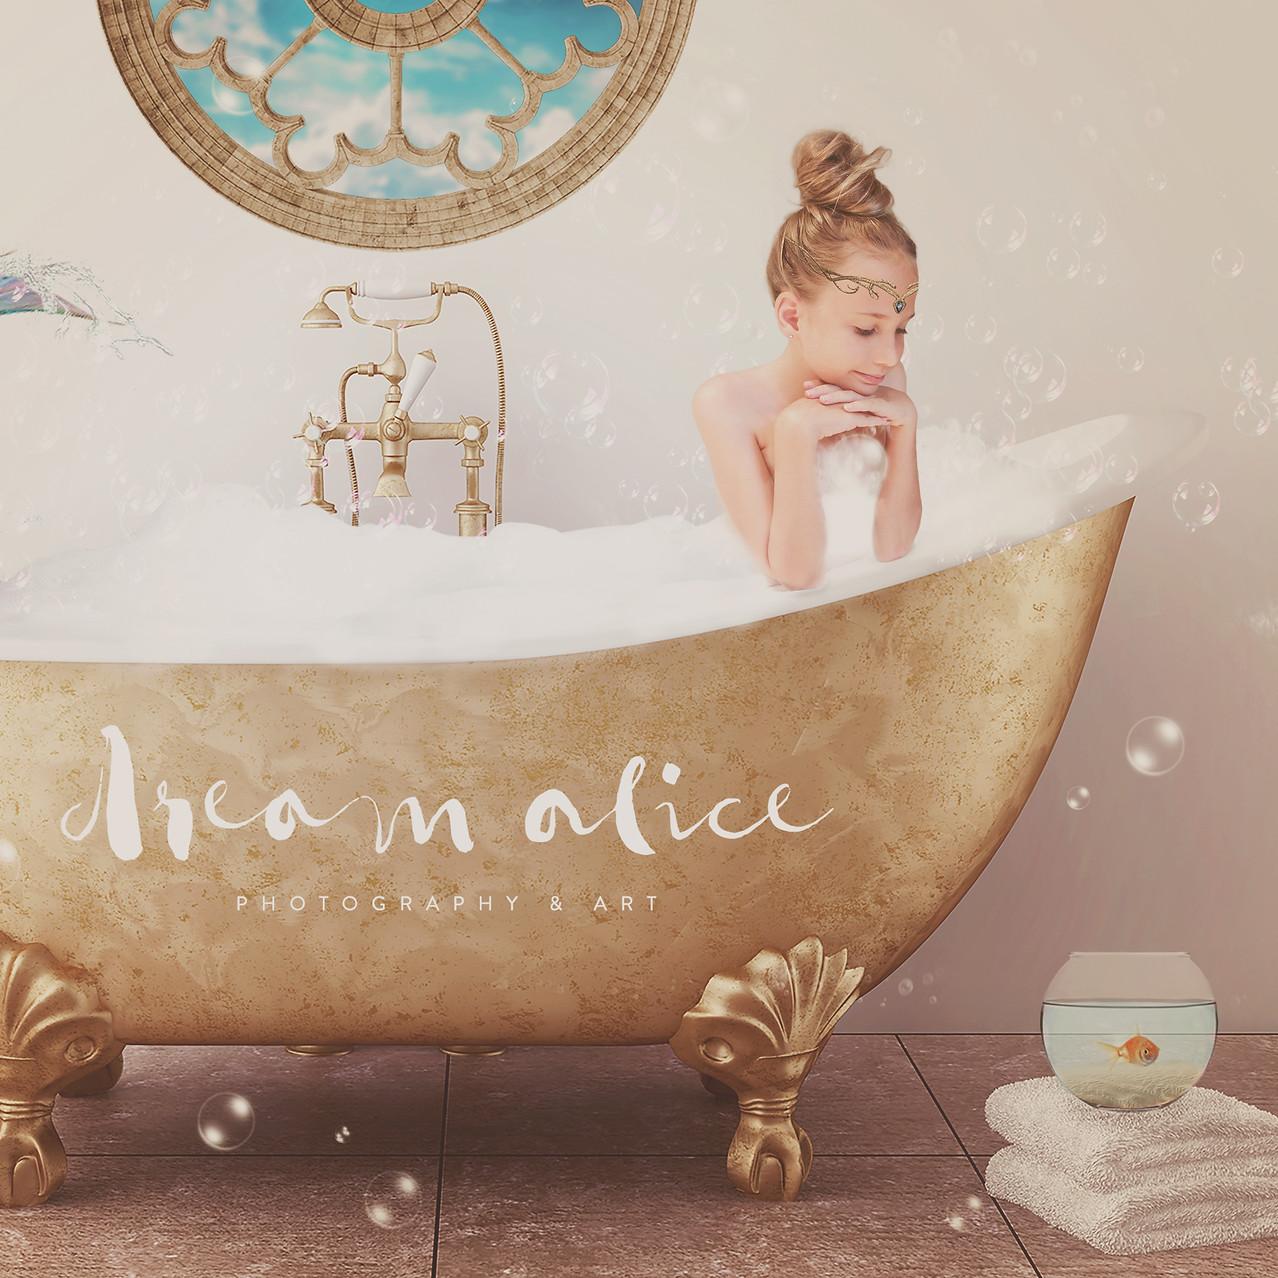 Mermaid Bath. Creative Children's Photography fantasy photoshoot, Dream Alice Photography & Art, Gold Coast